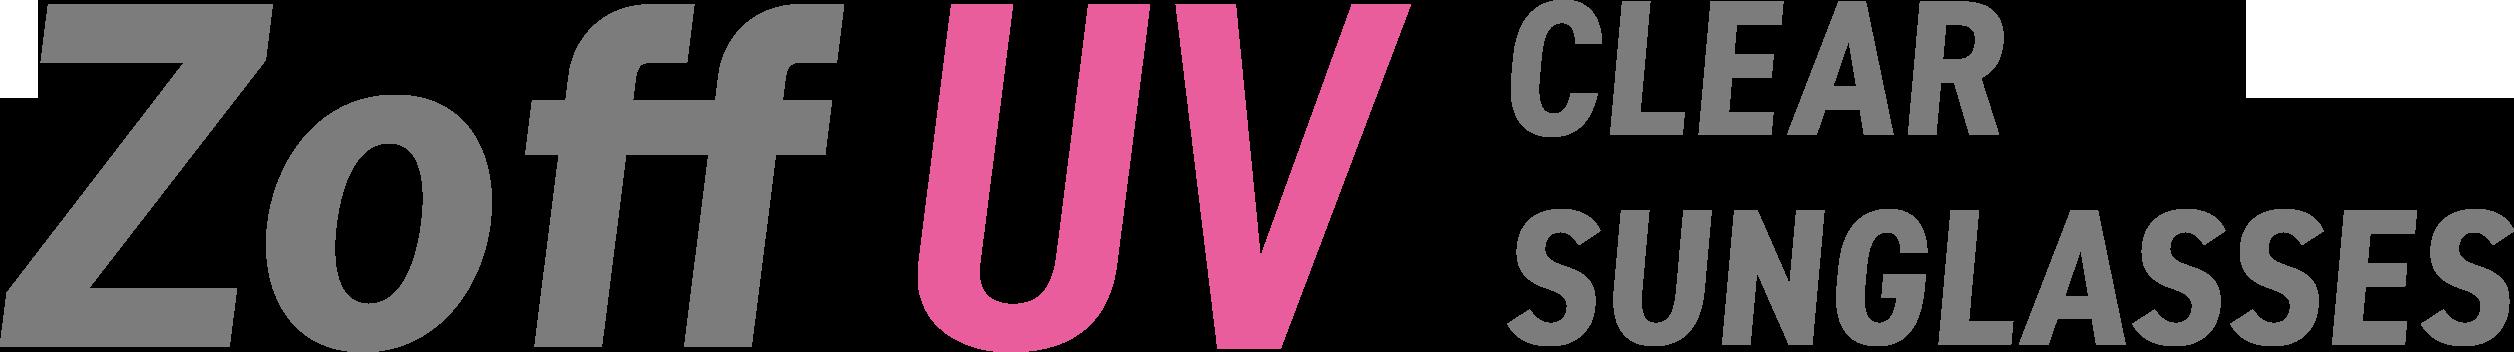 Zoff UV